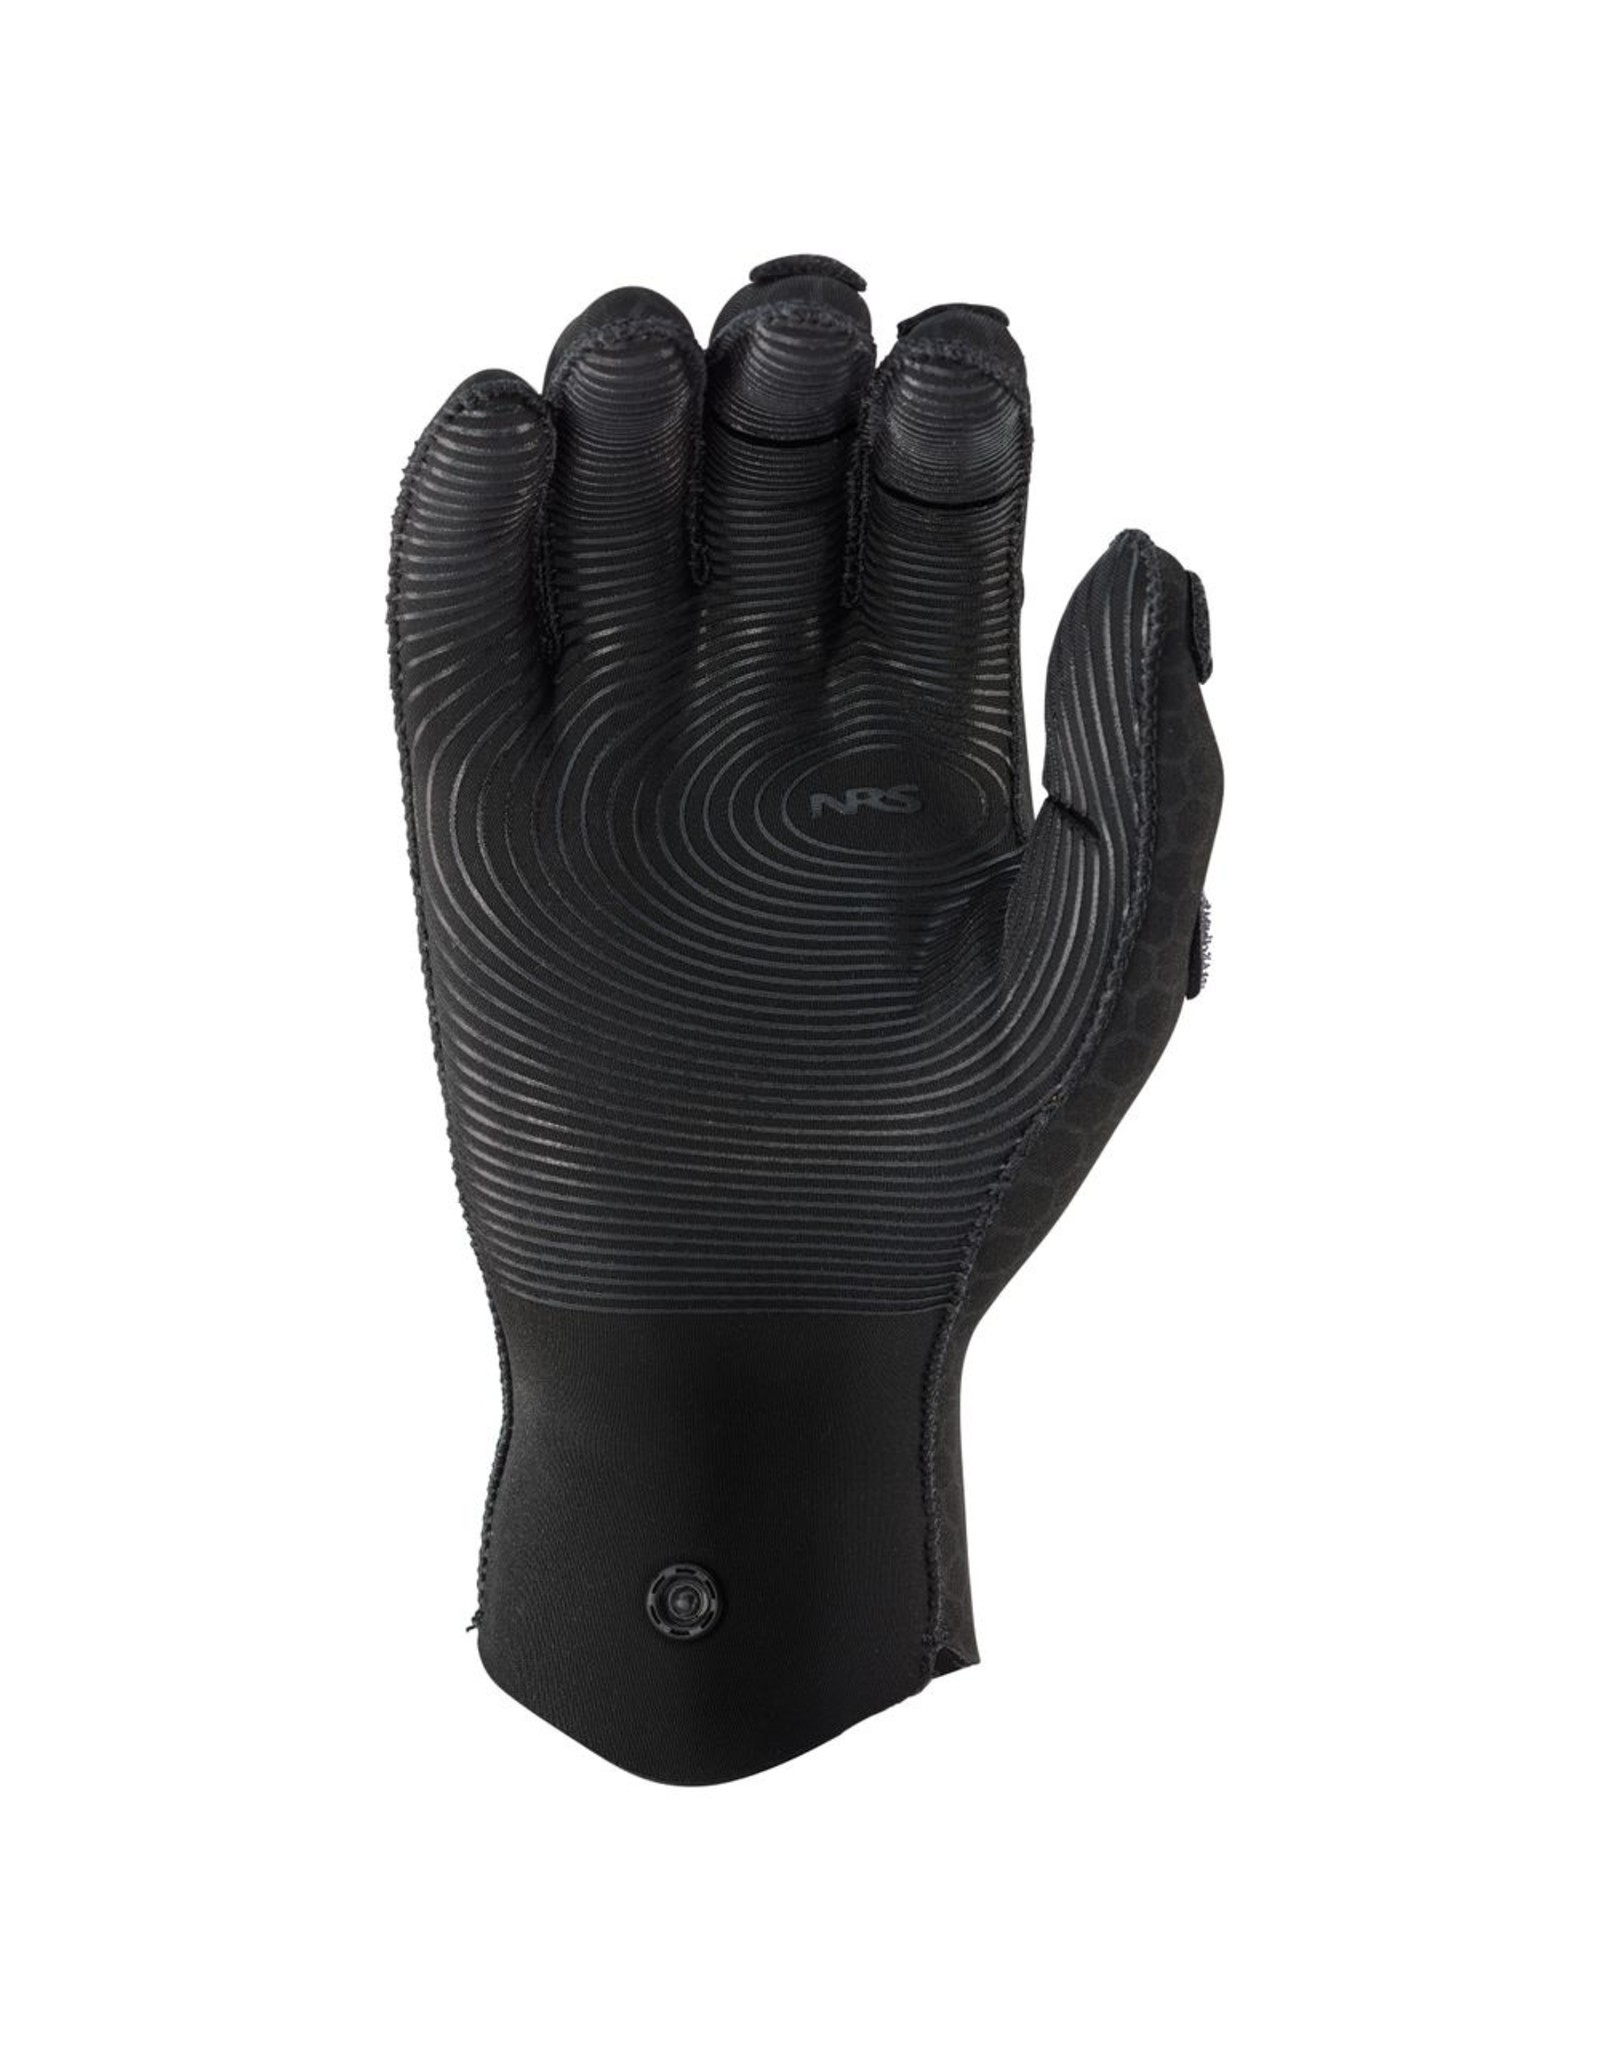 NRS NRS HydroSkin 2.0 Forecast Gloves